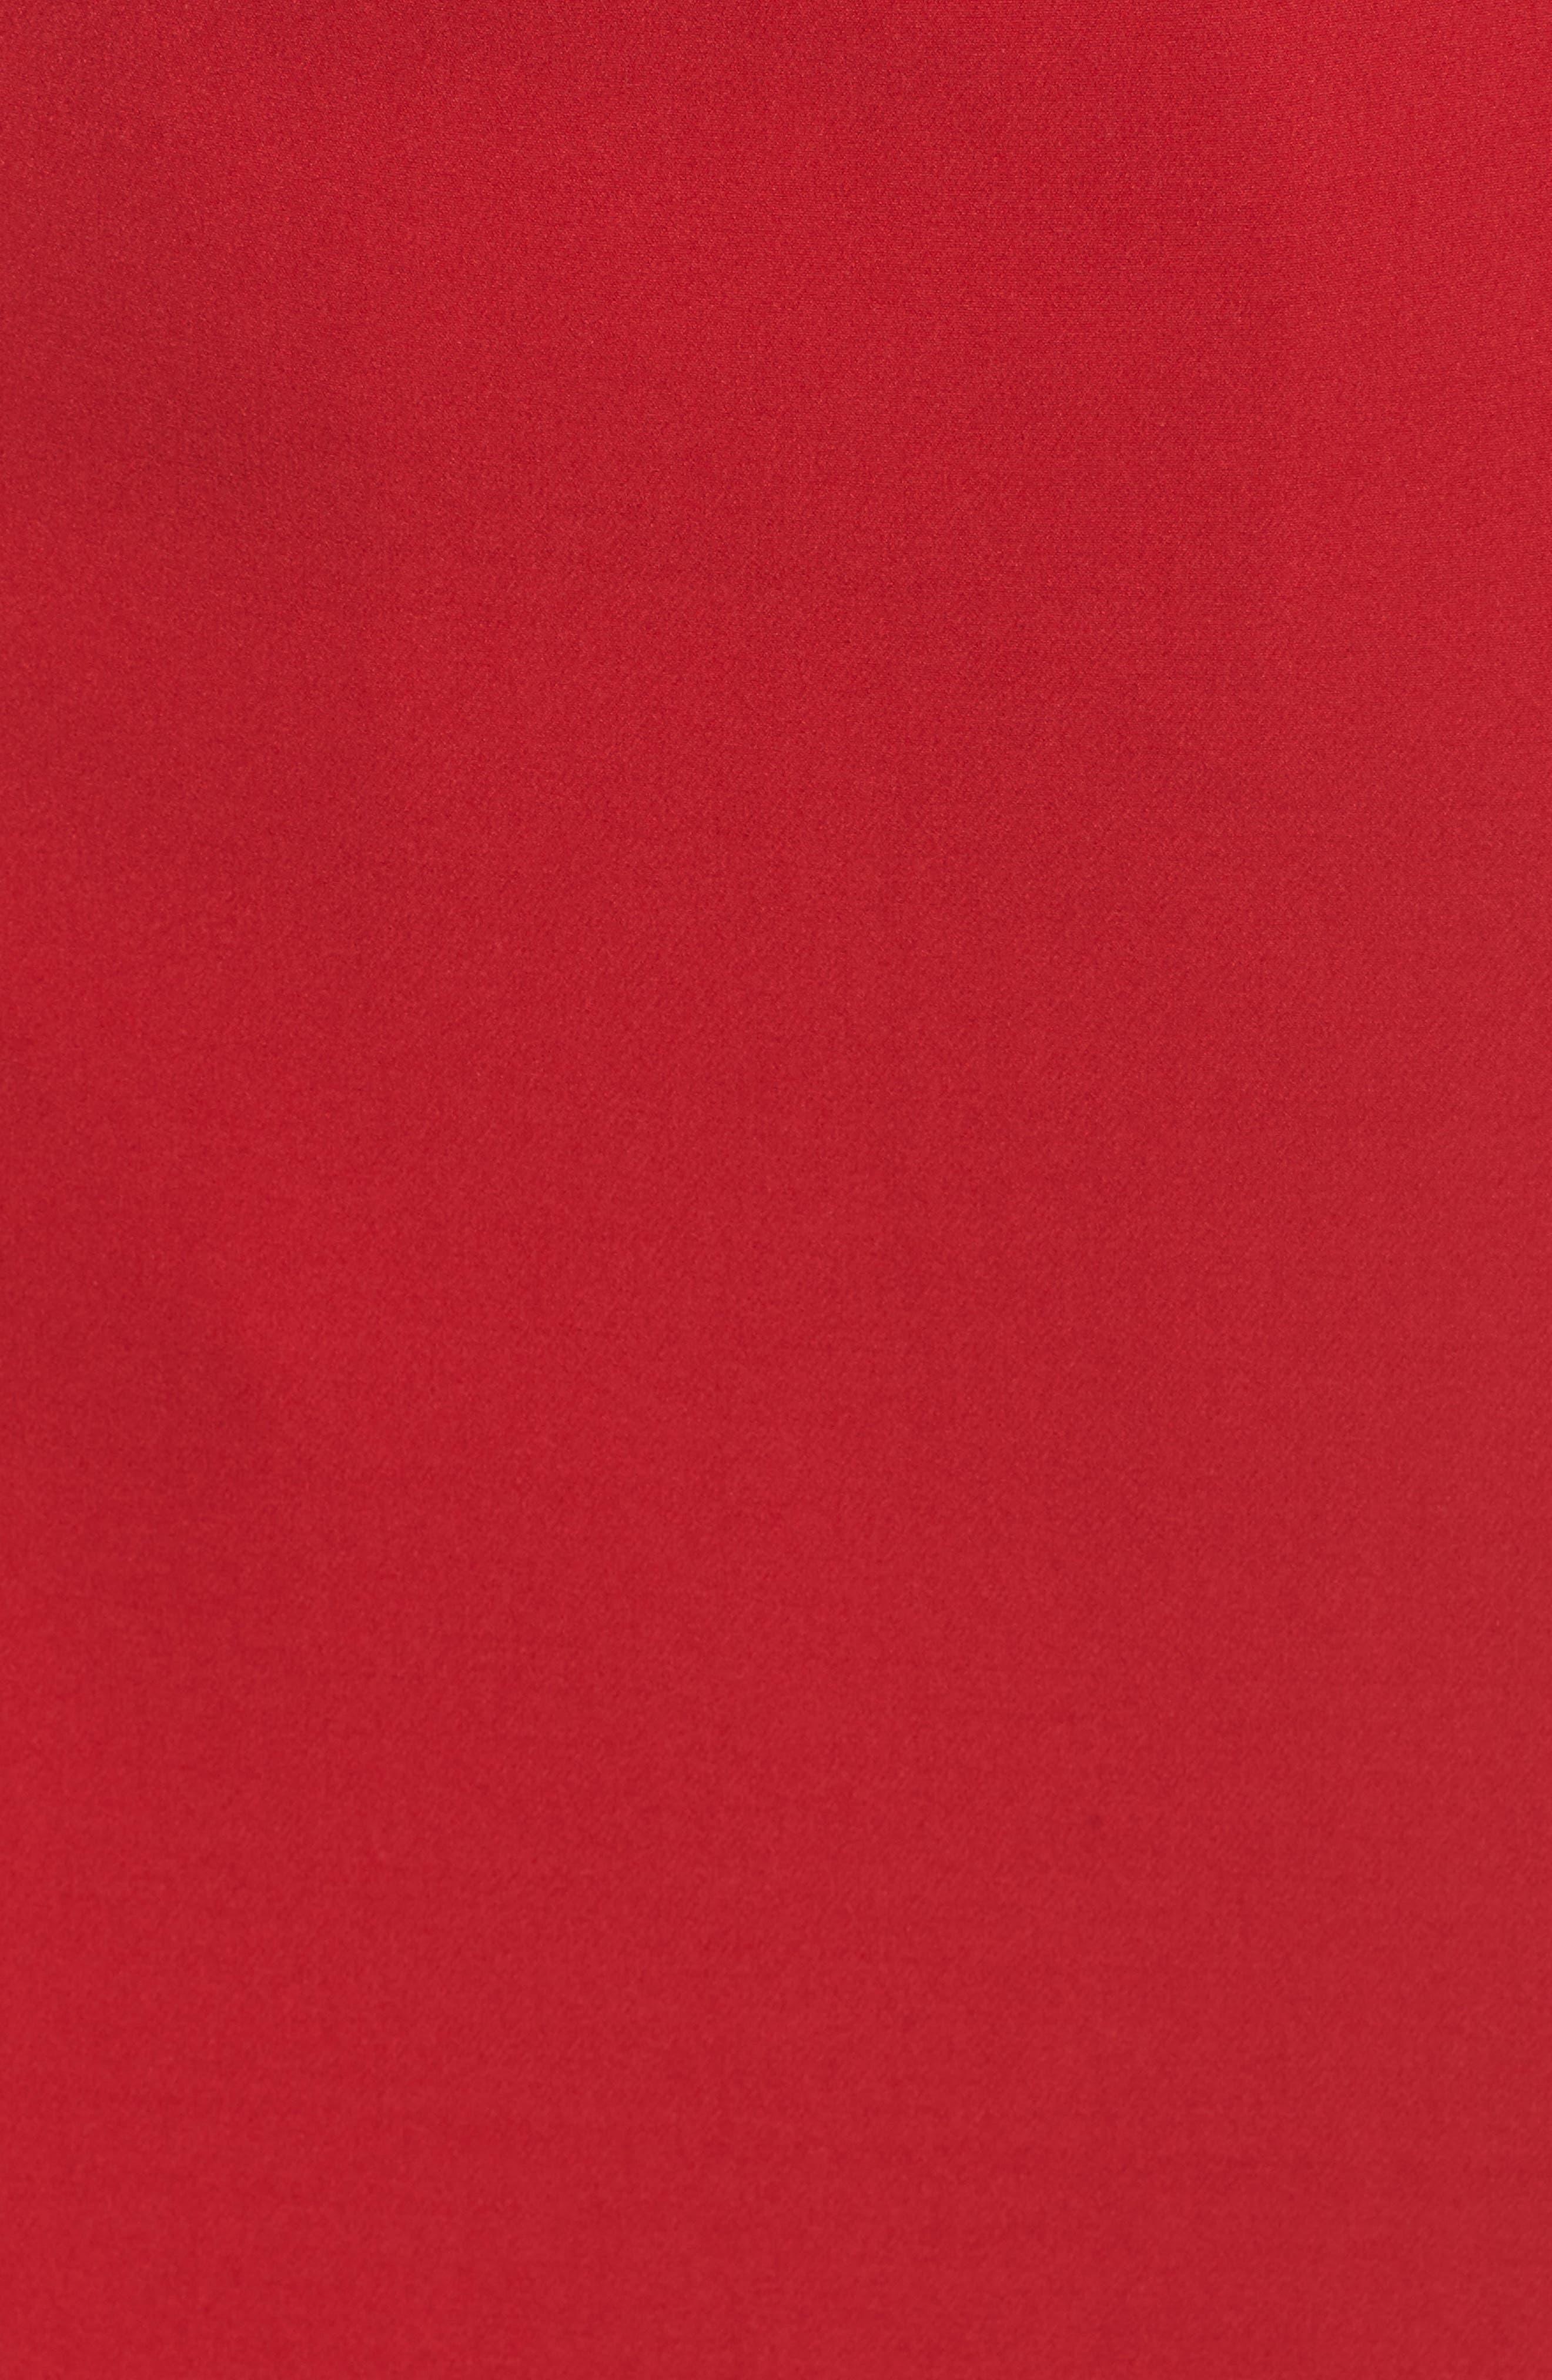 Ruffle Stretch Crepe Sheath Dress,                             Alternate thumbnail 28, color,